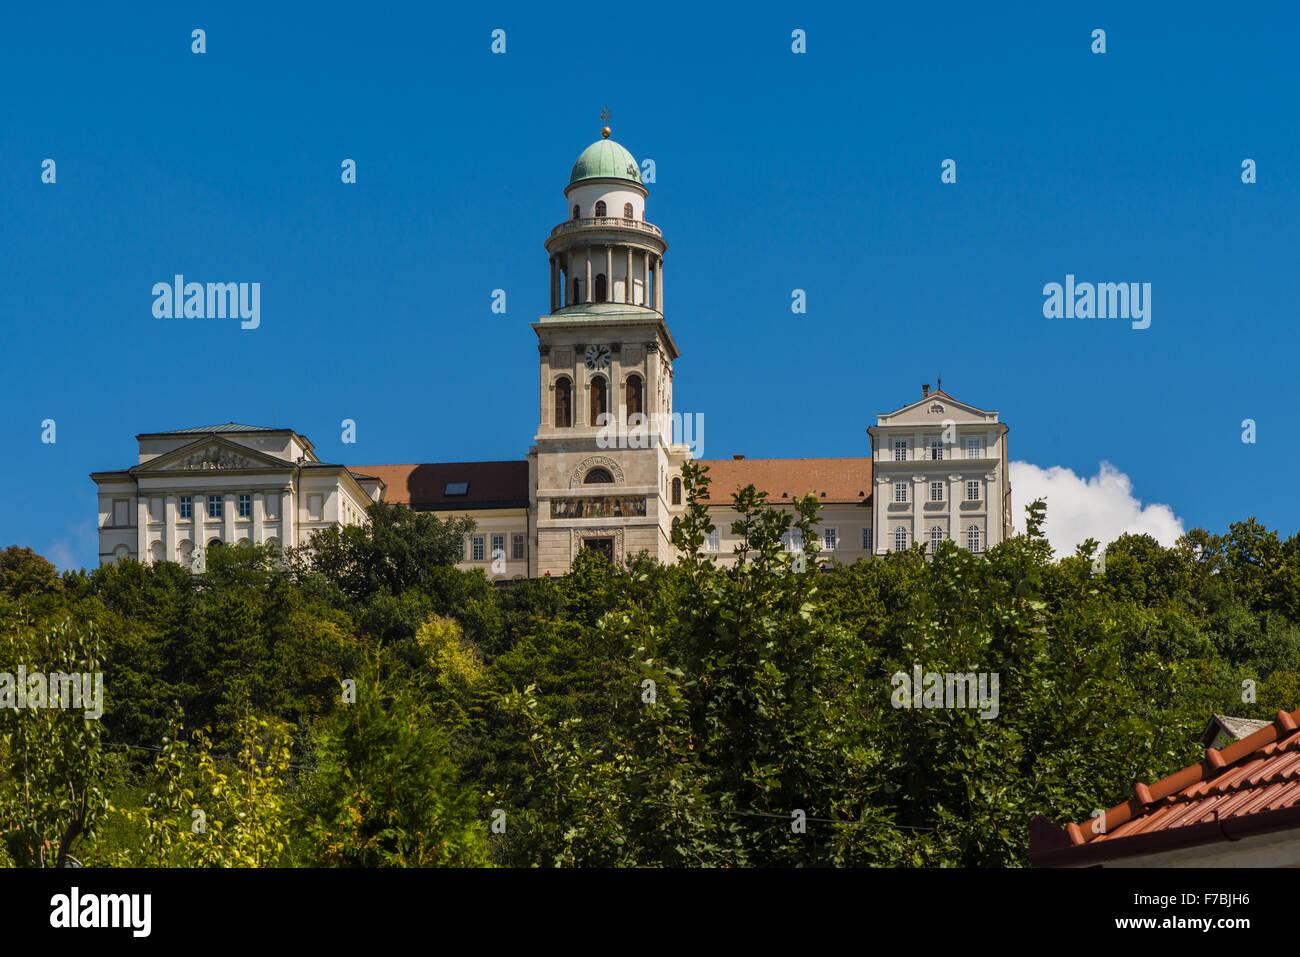 Pannonhalma, monastery on Martins hill, Hungary, Western Hungary - Stock Image